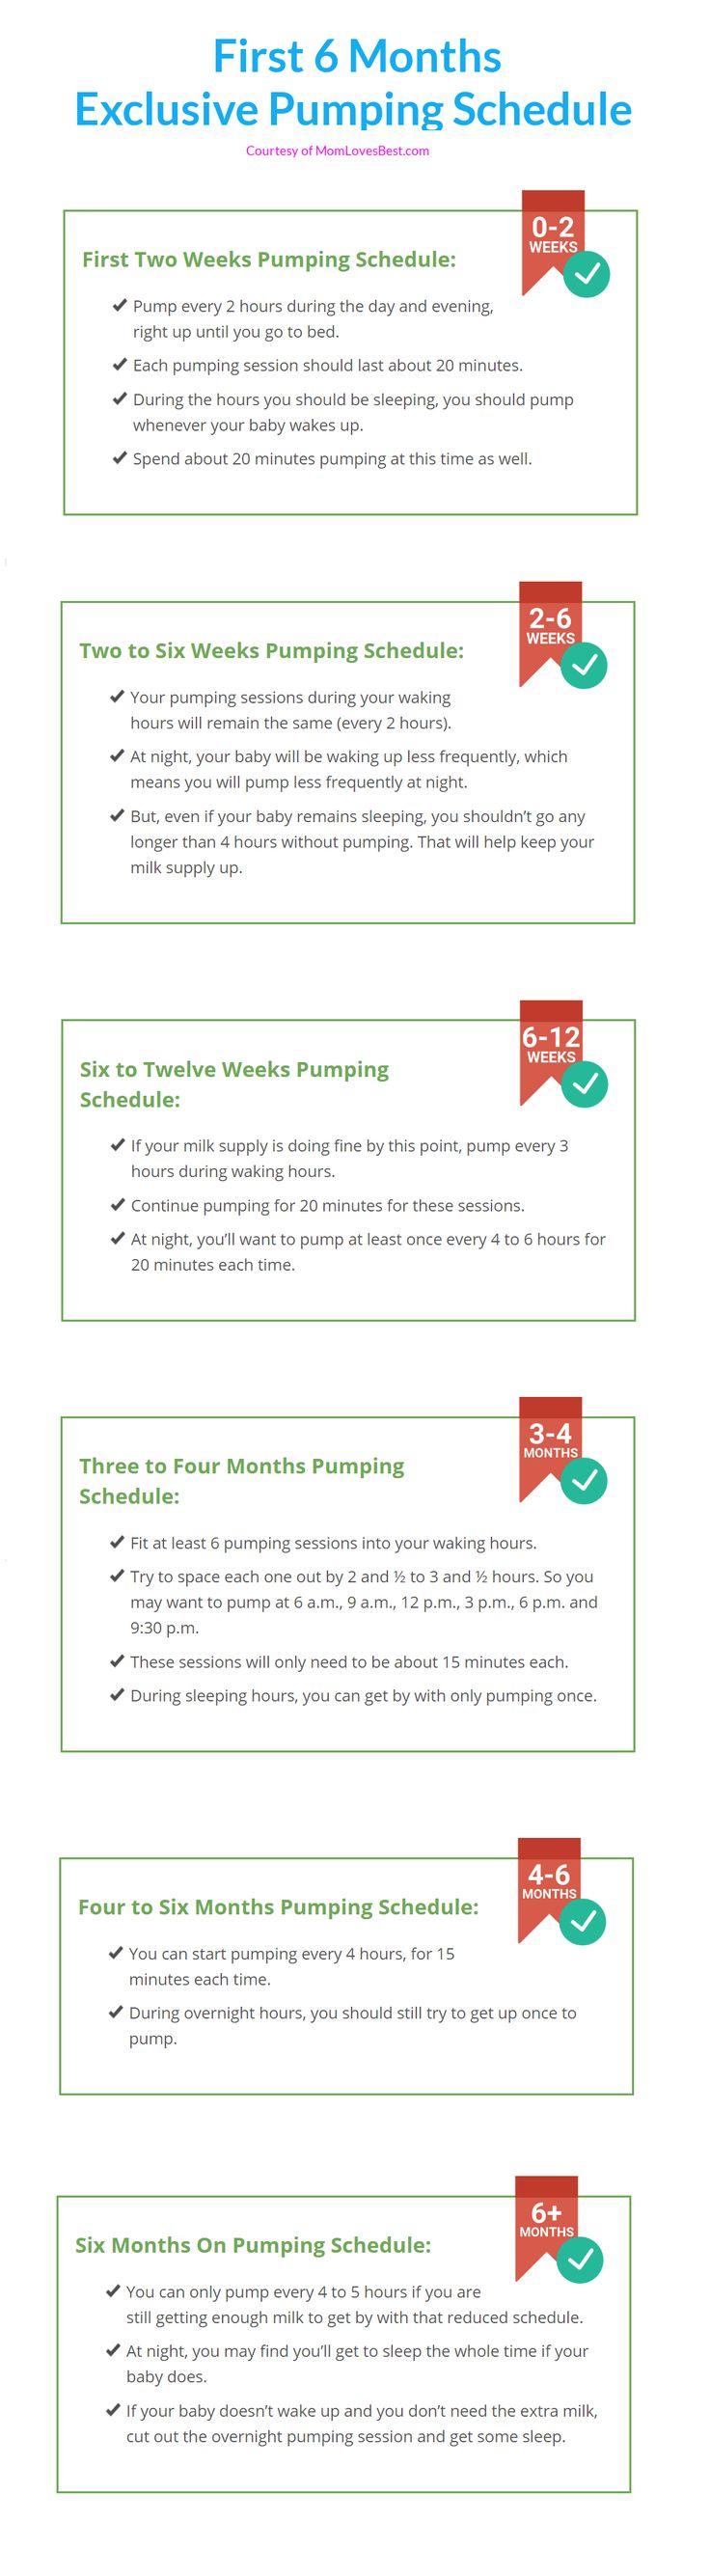 Best 25 Pumping schedule ideas on Pinterest